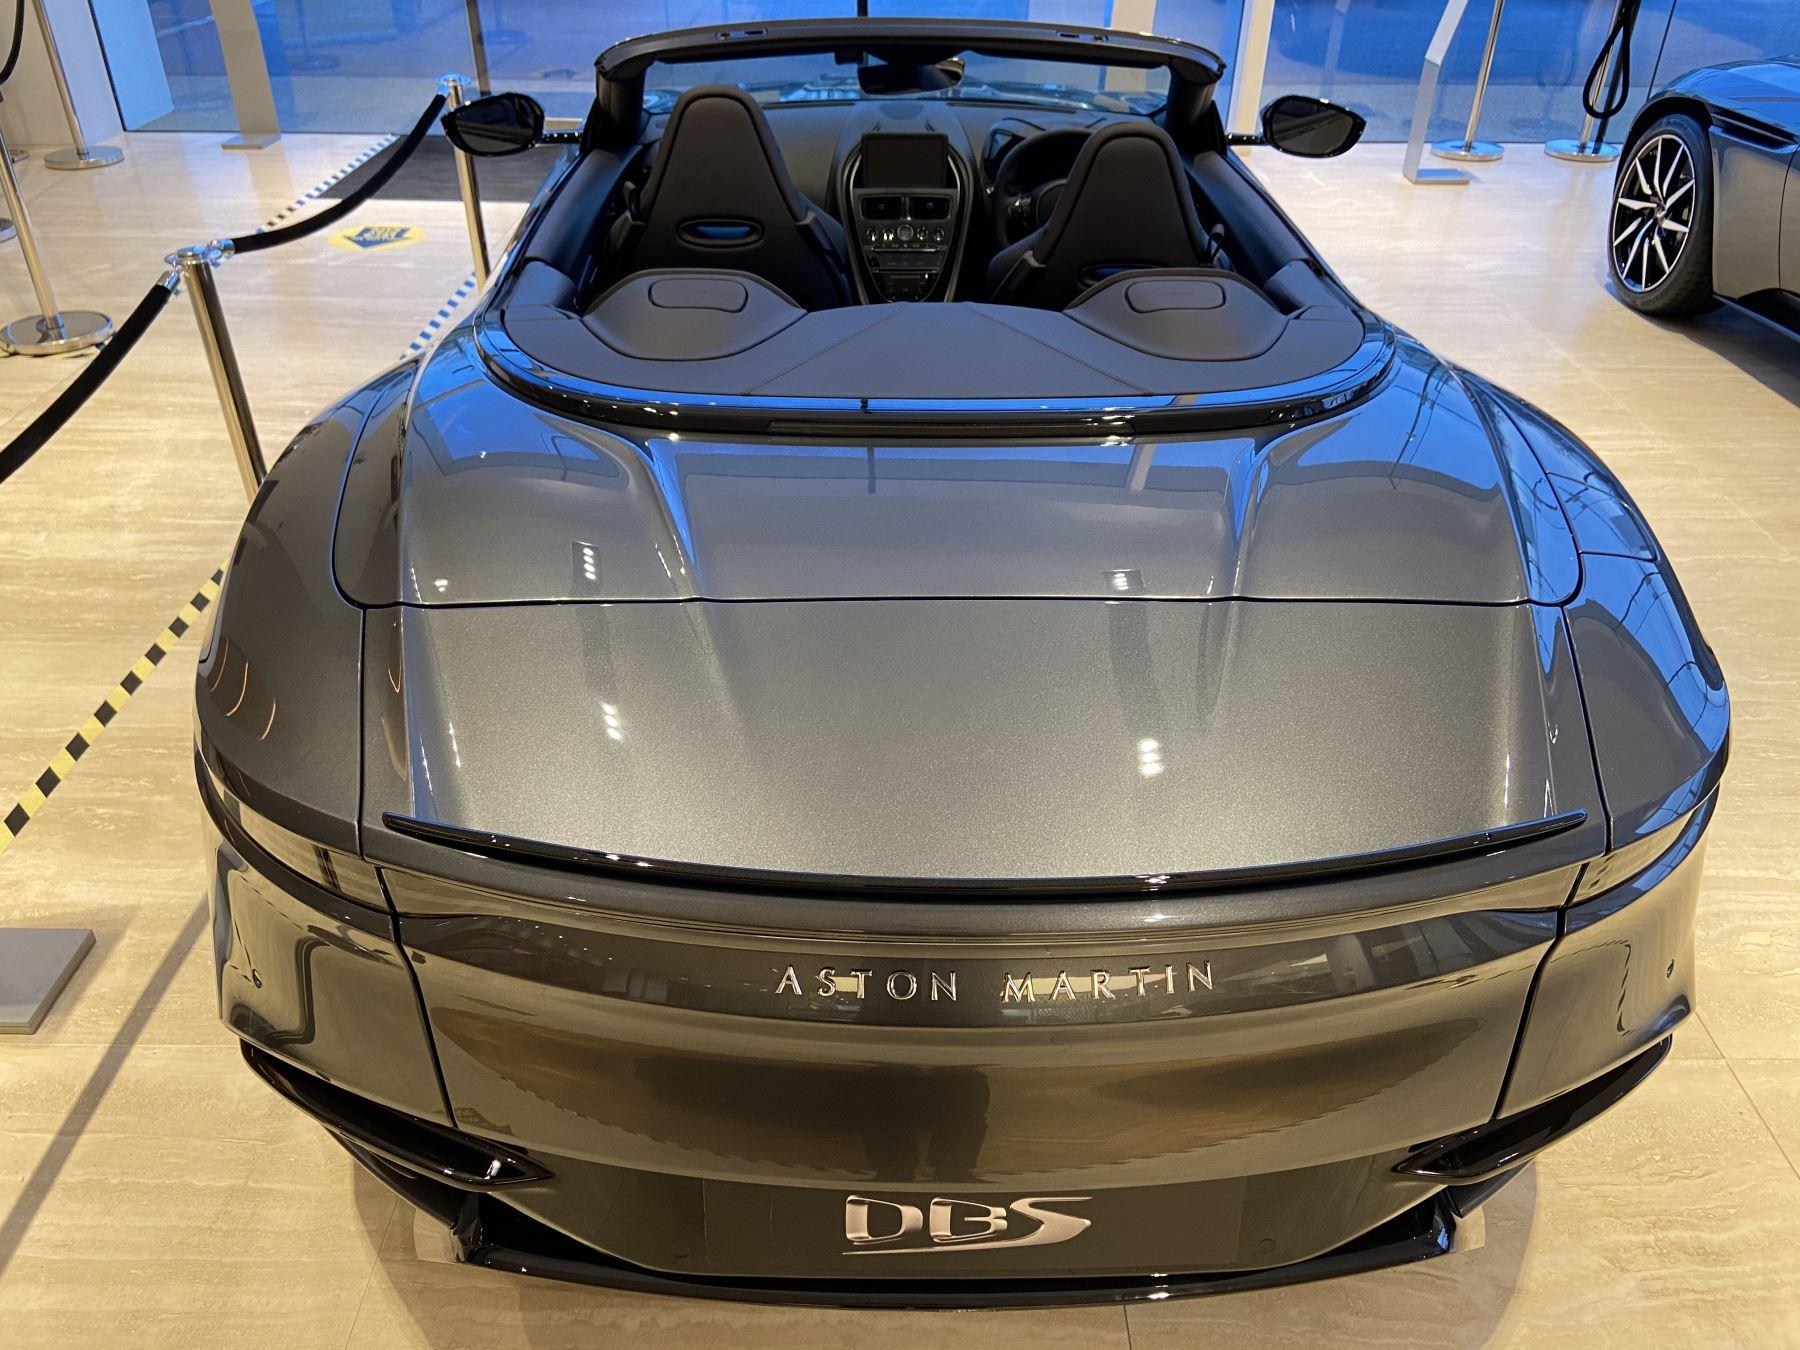 Aston Martin DBS V12 Superleggera Volante Touchtronic image 10